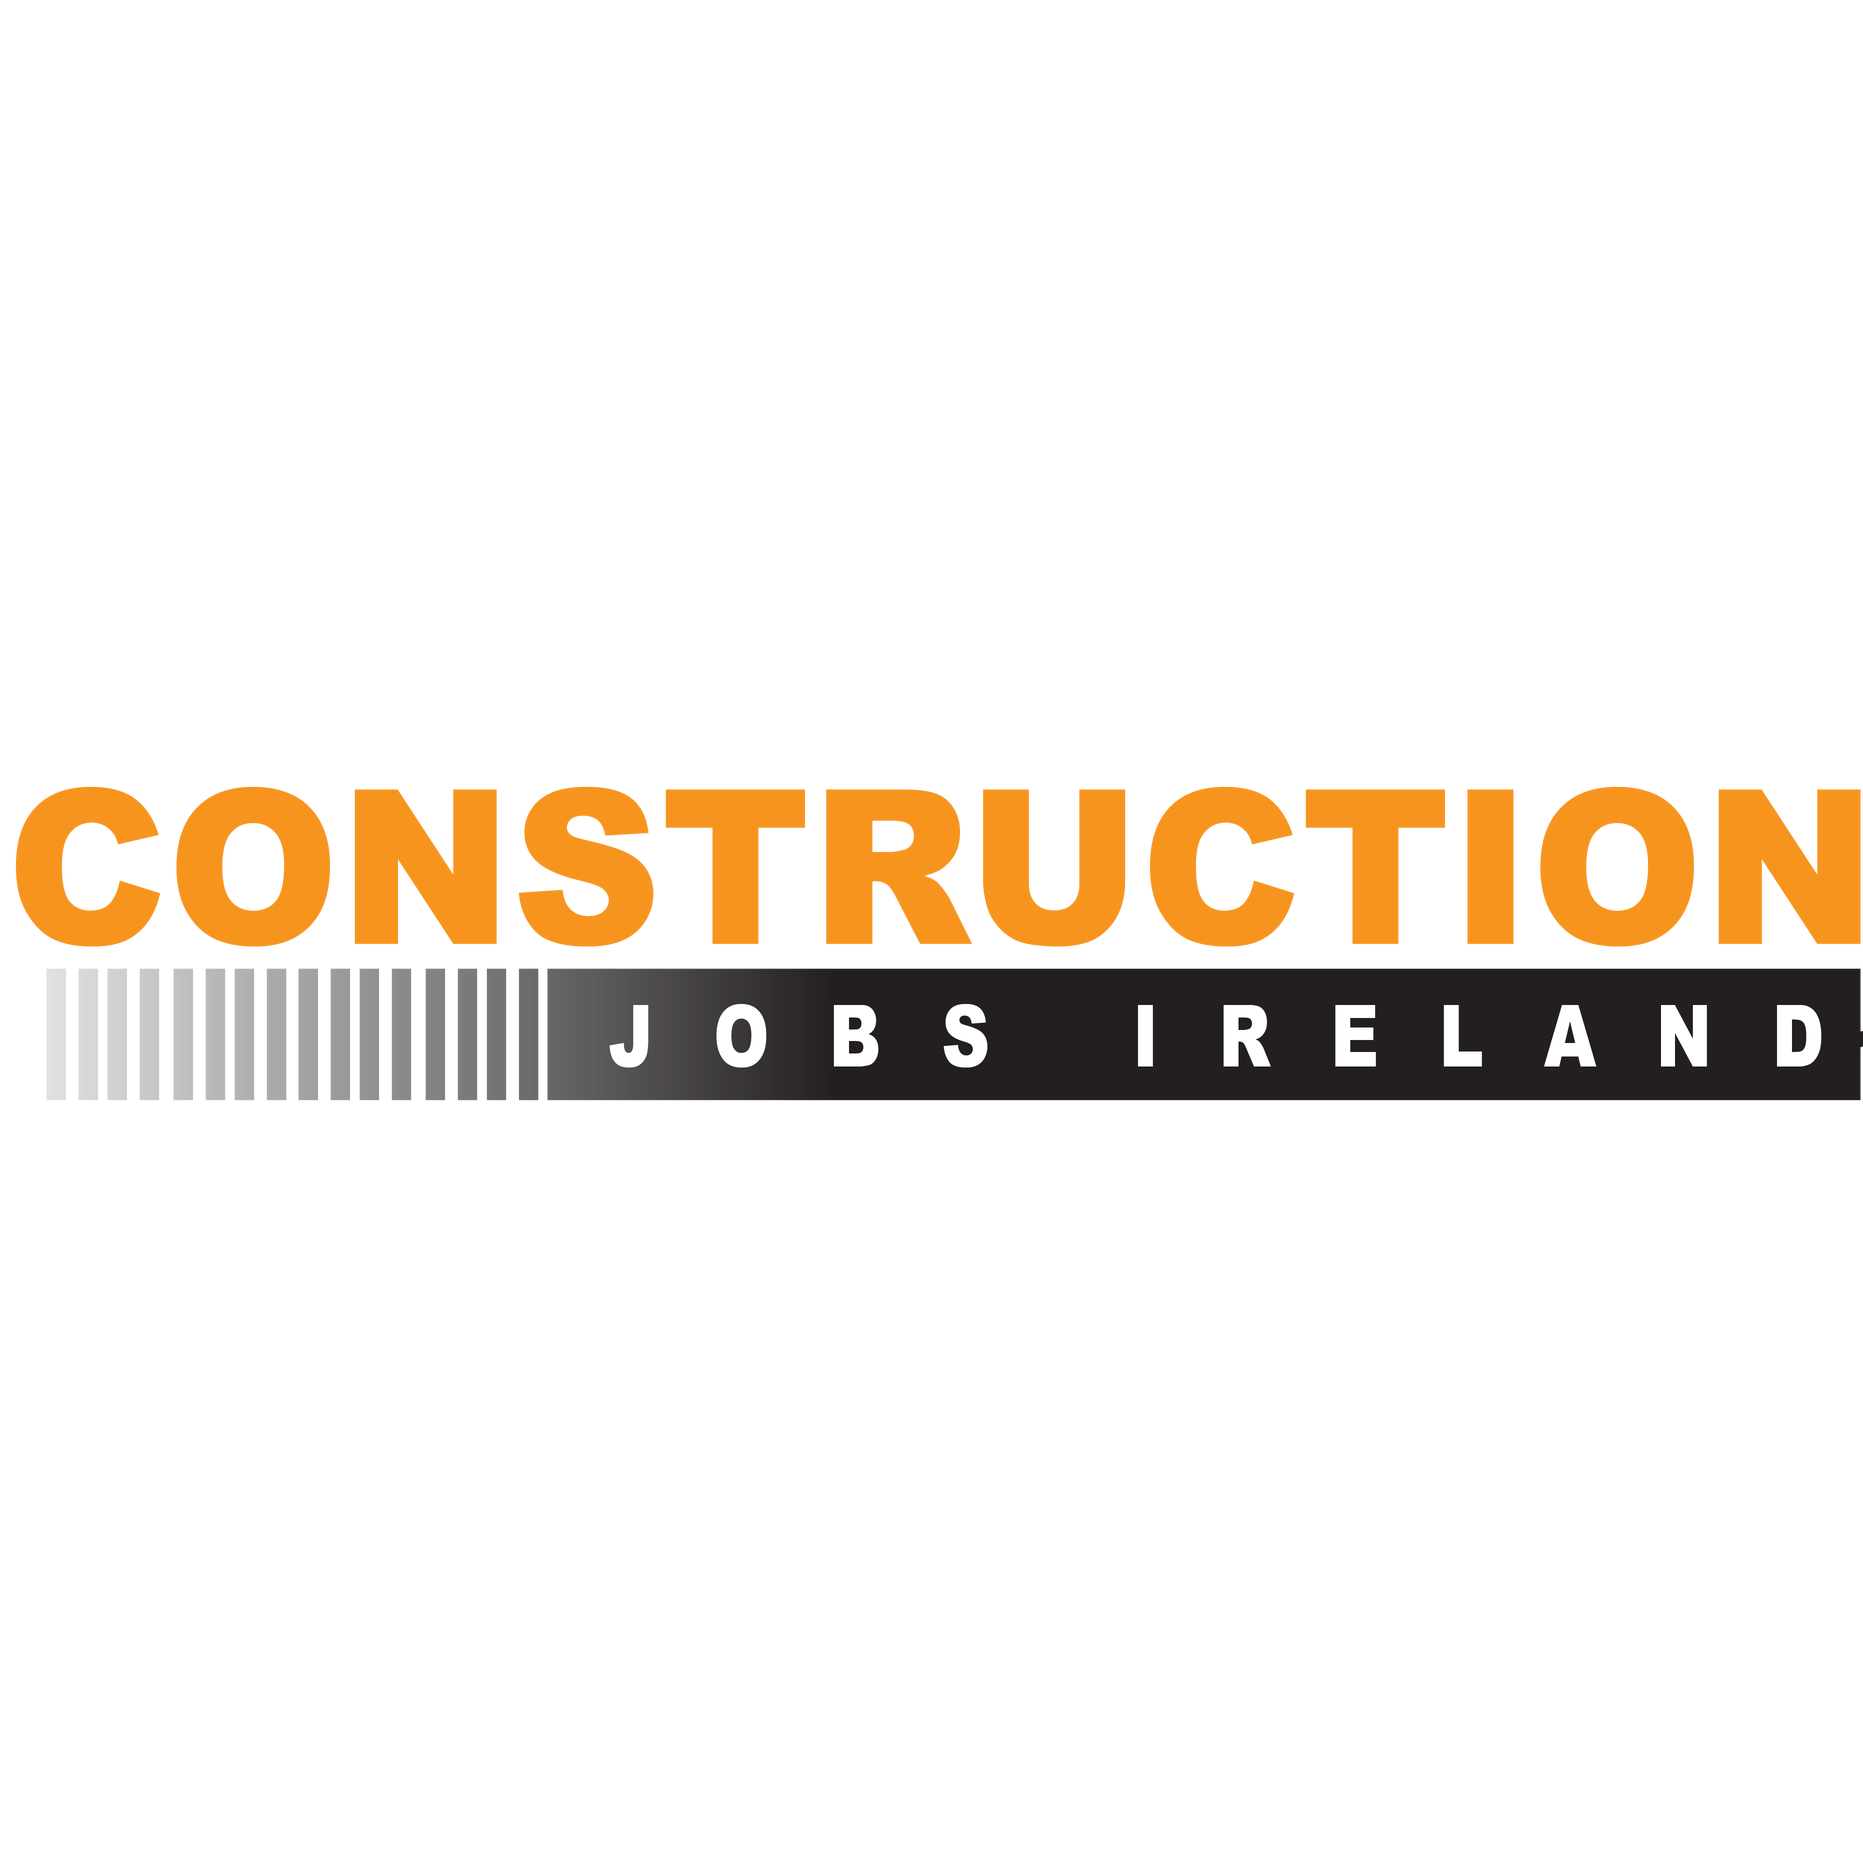 Ireland Construction Jobs - Dublin | Northern Ireland  | Cork | Galway | Donegal